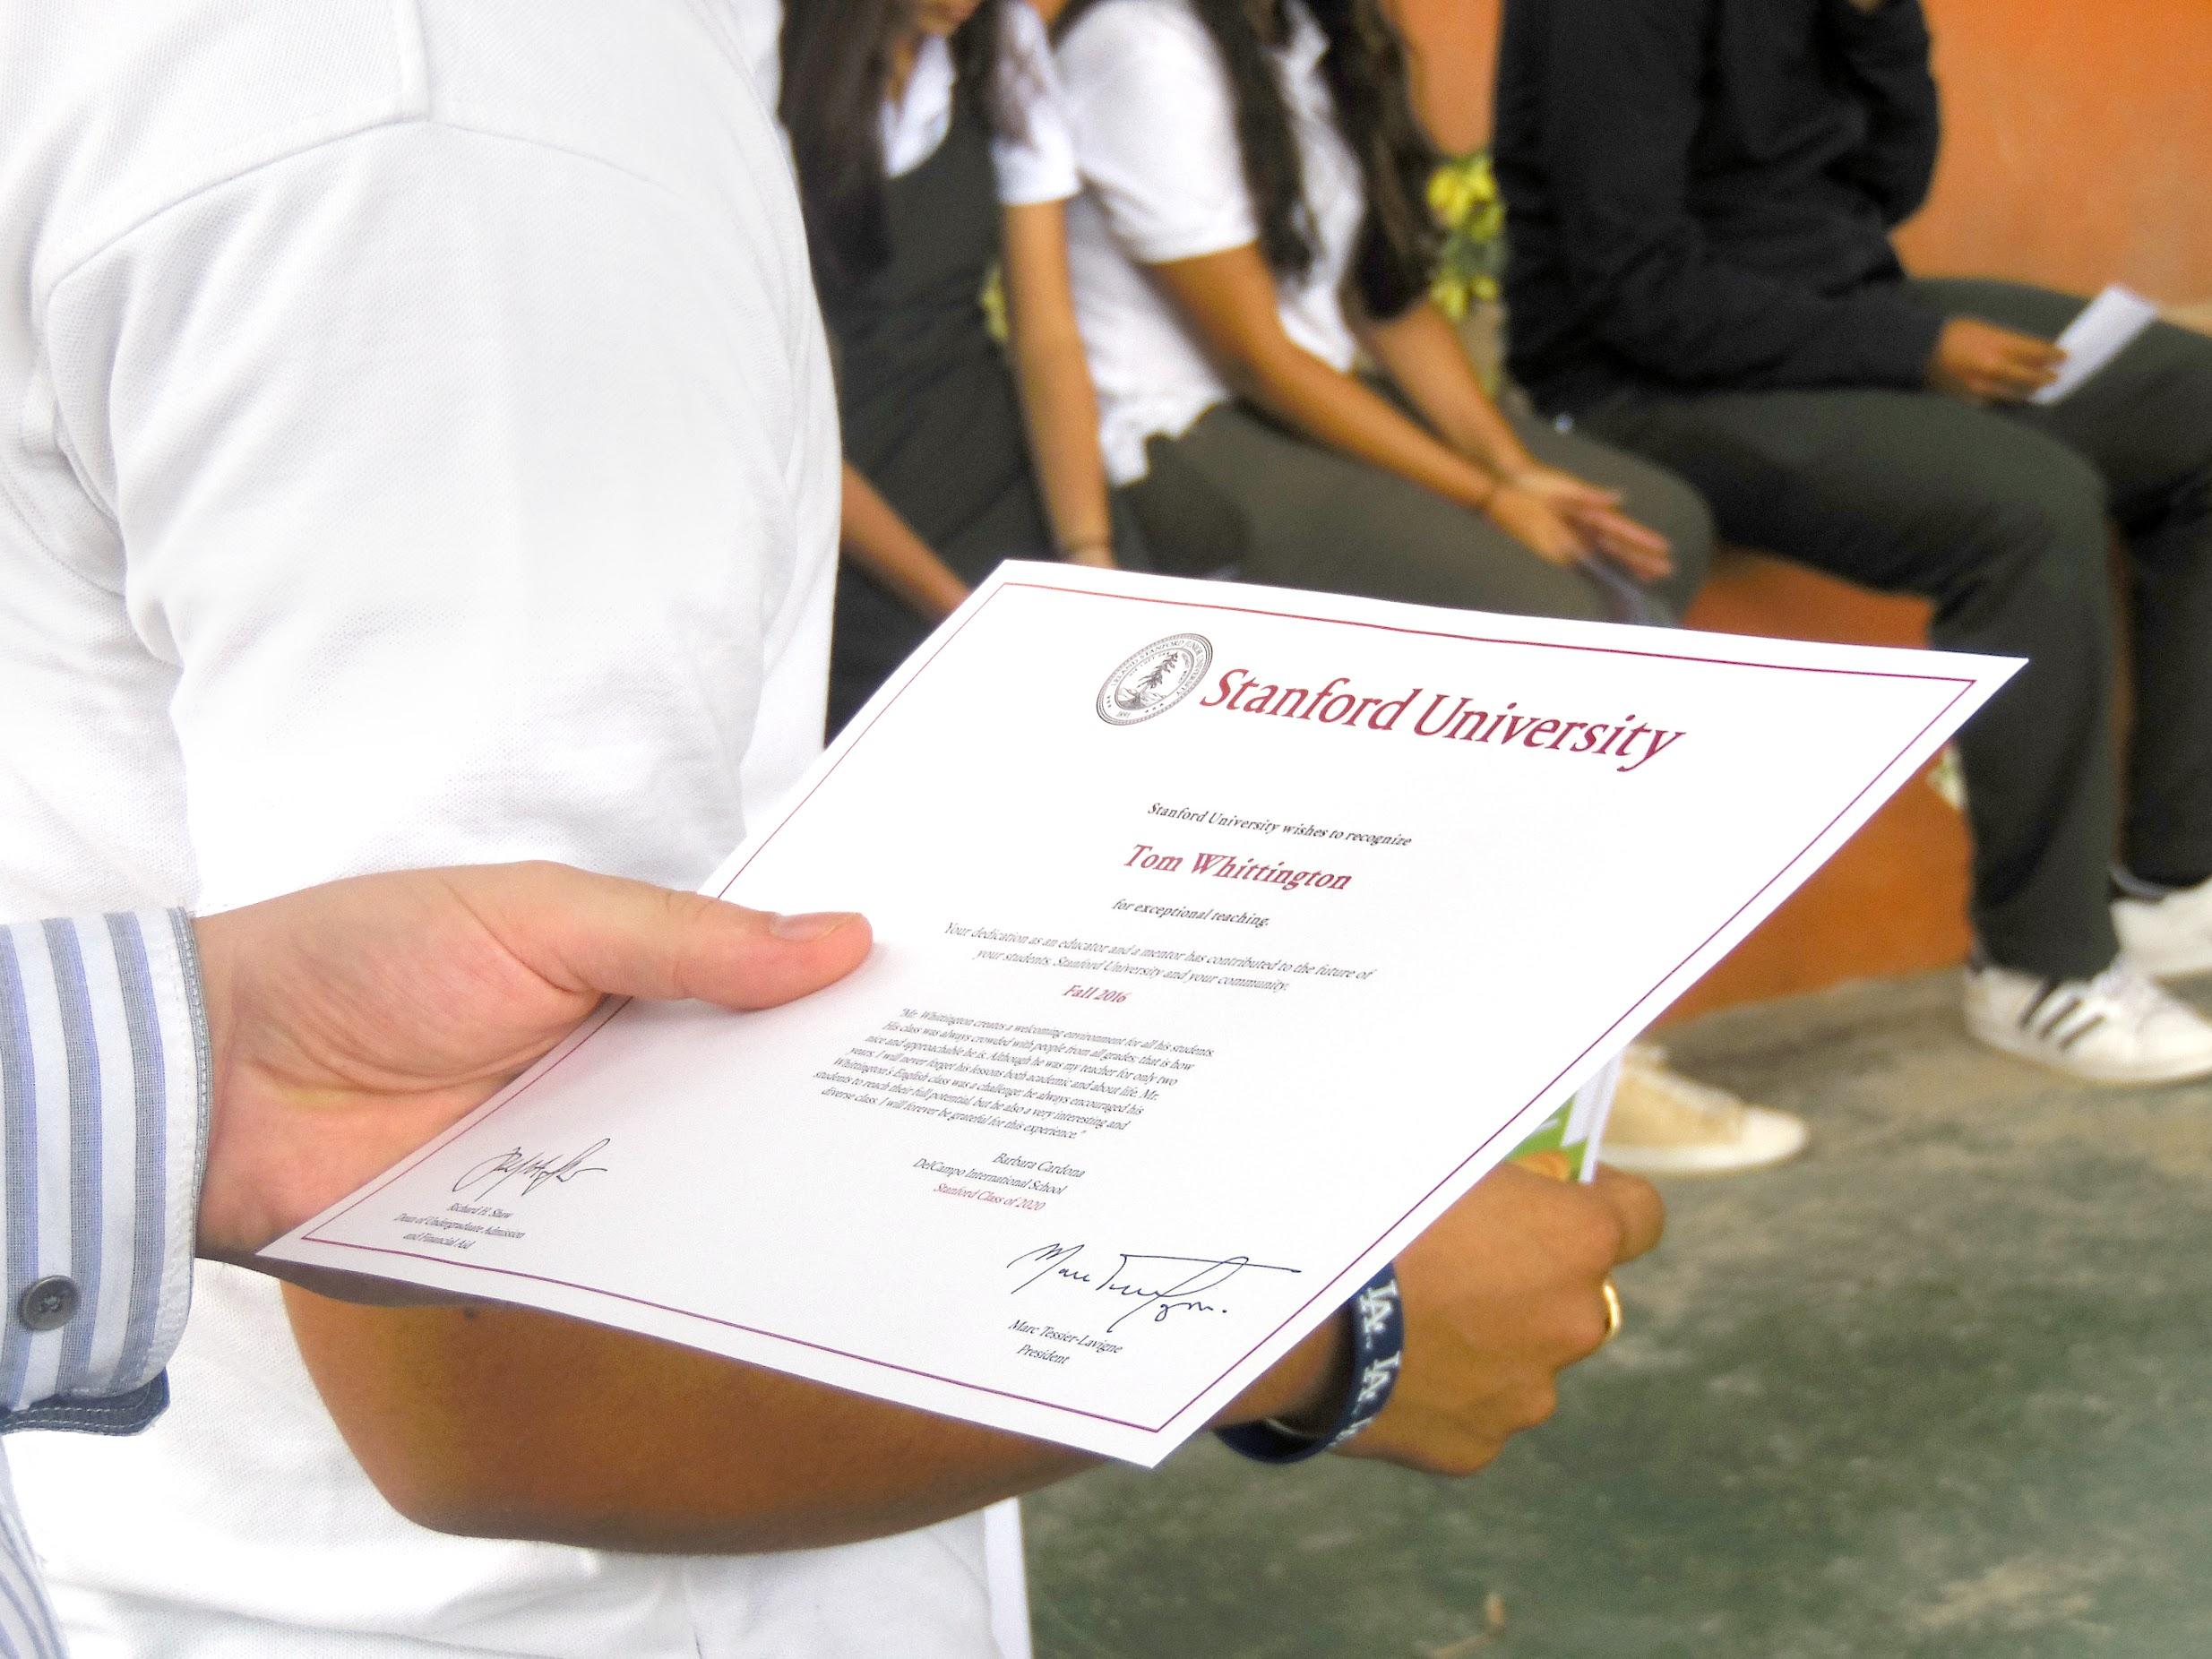 DelCampo International School Stanford University Diploma